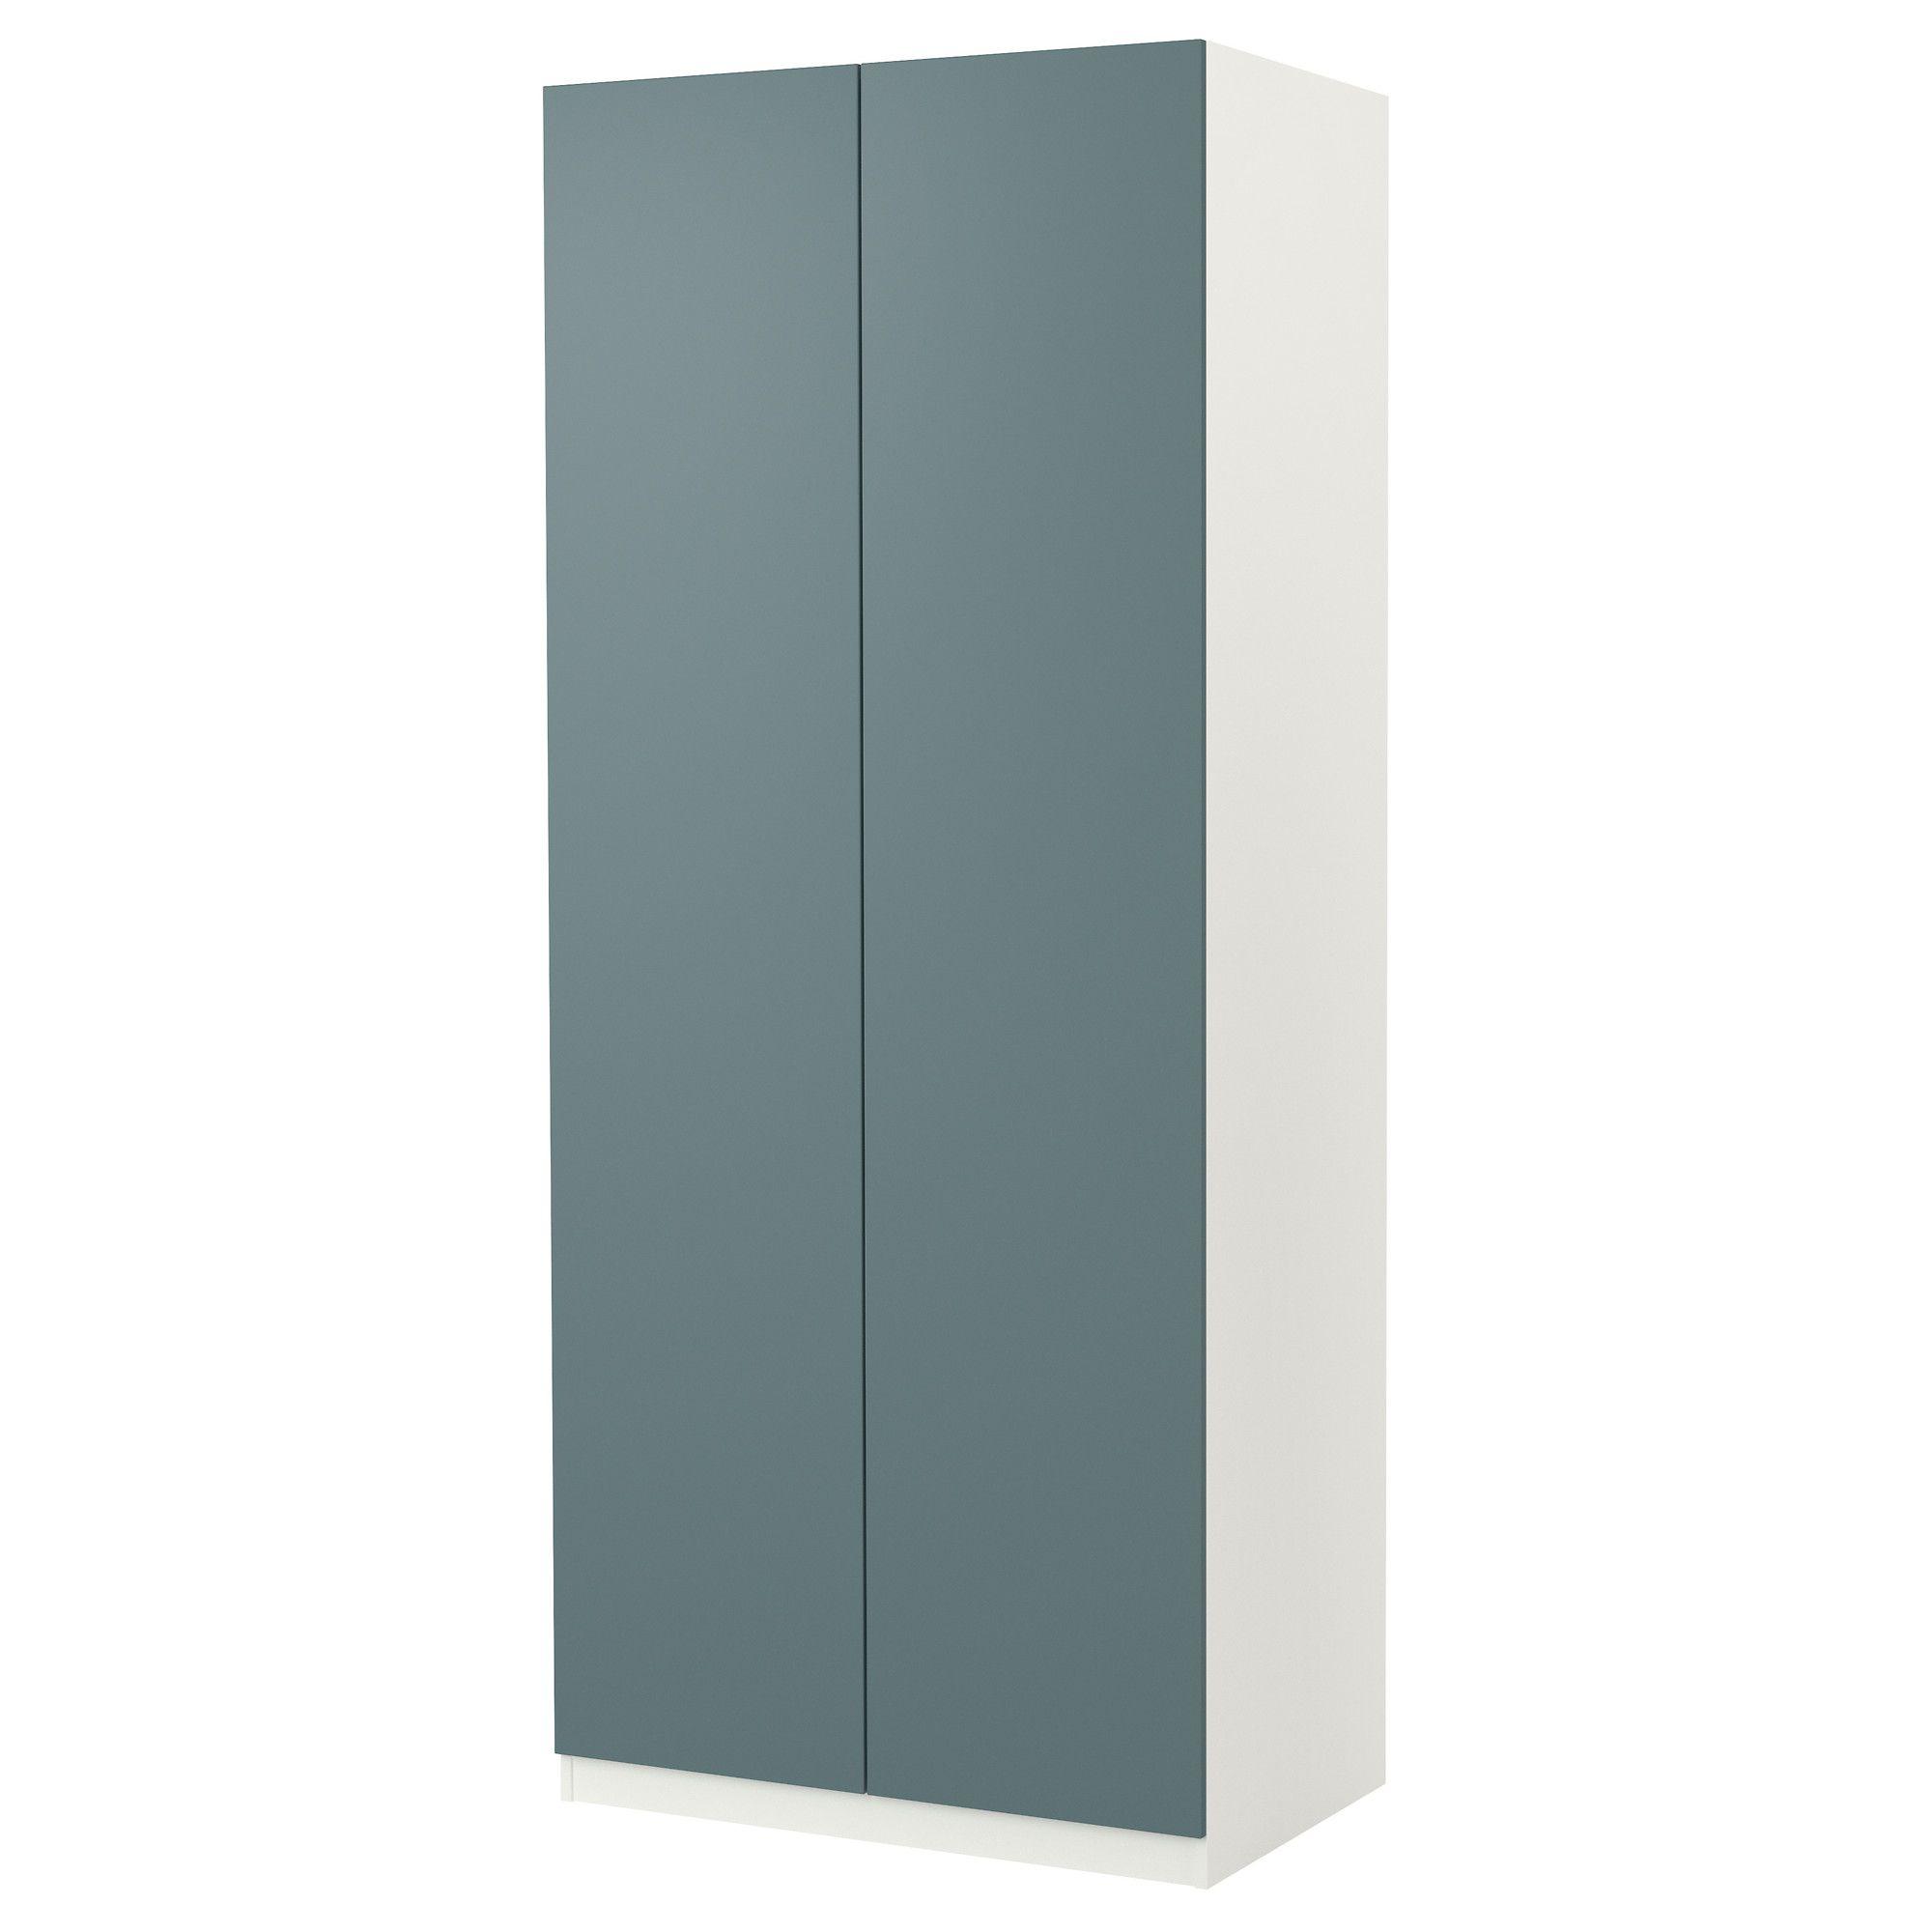 PAX Armoire 2 portes Tanem turquoise, blanc, 100x37x236